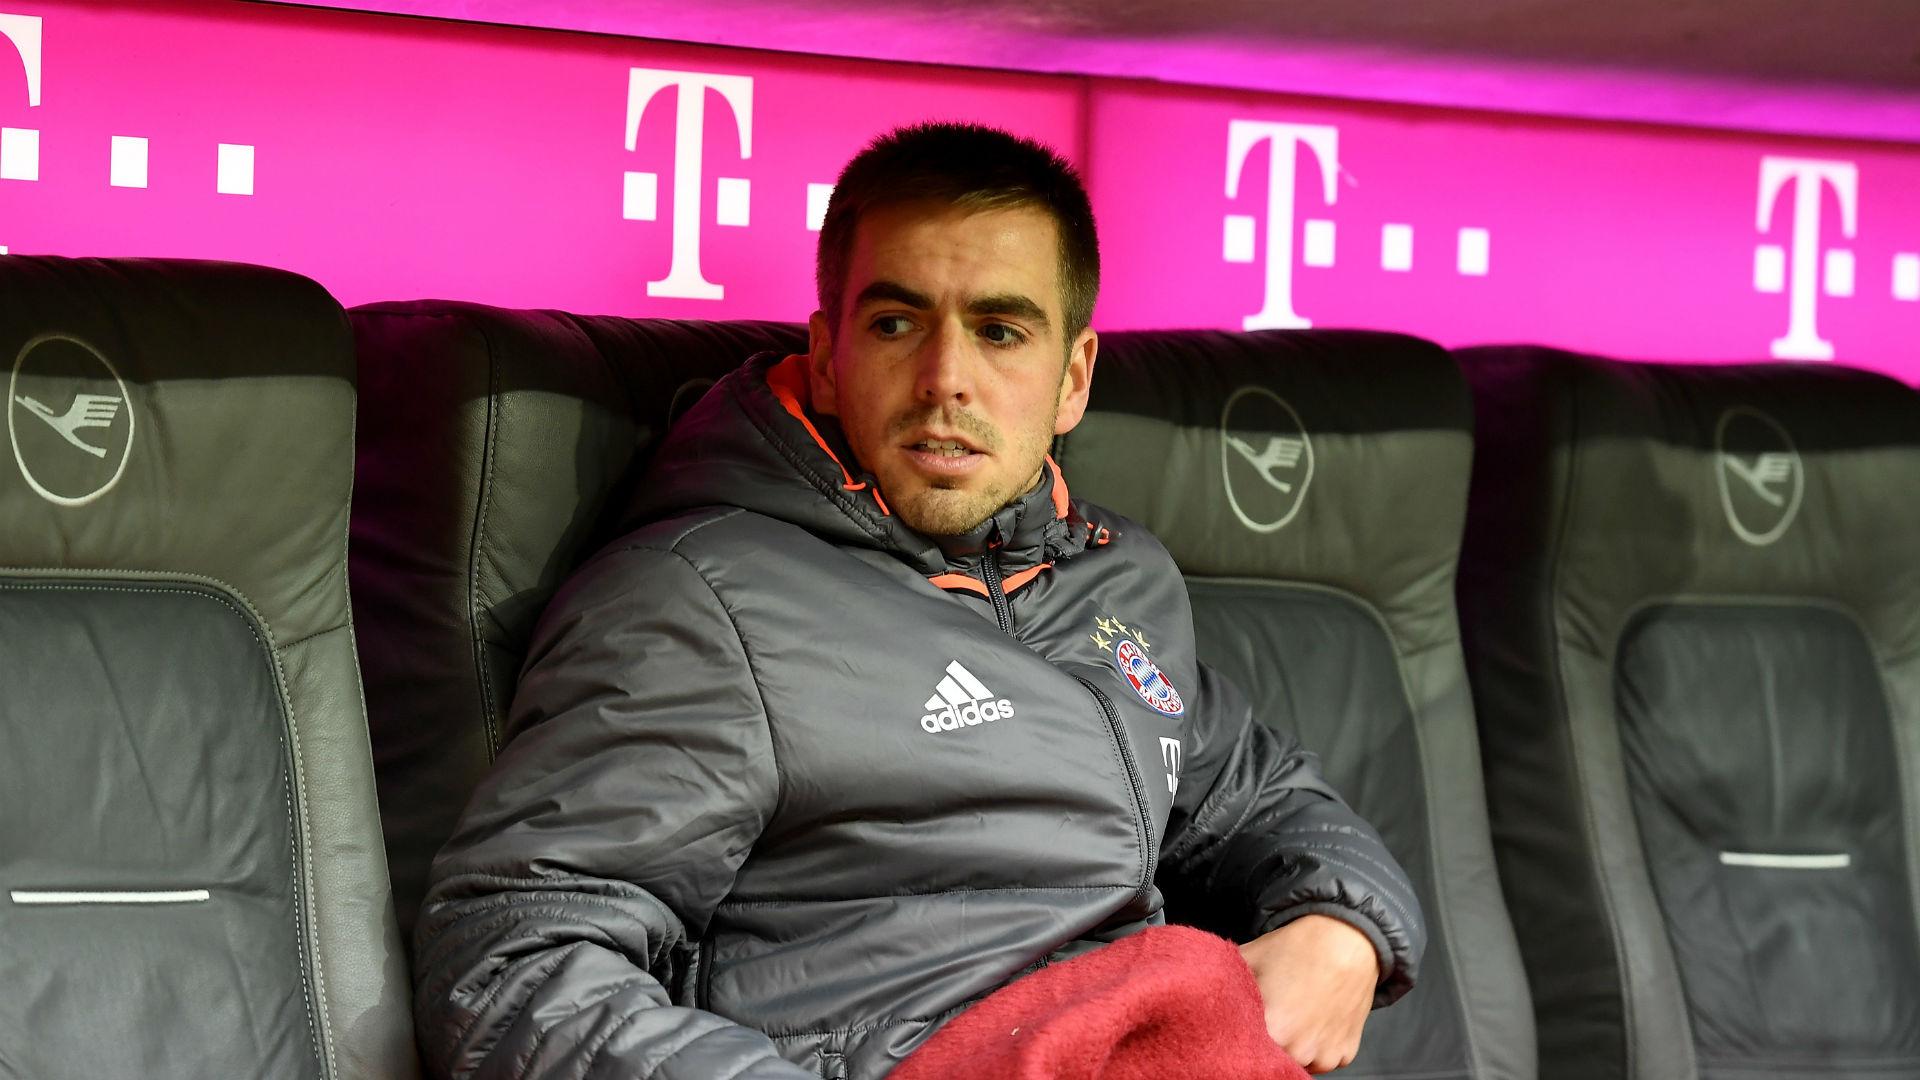 Bayern Munich part company with coach Carlo Ancelotti after PSG defeat